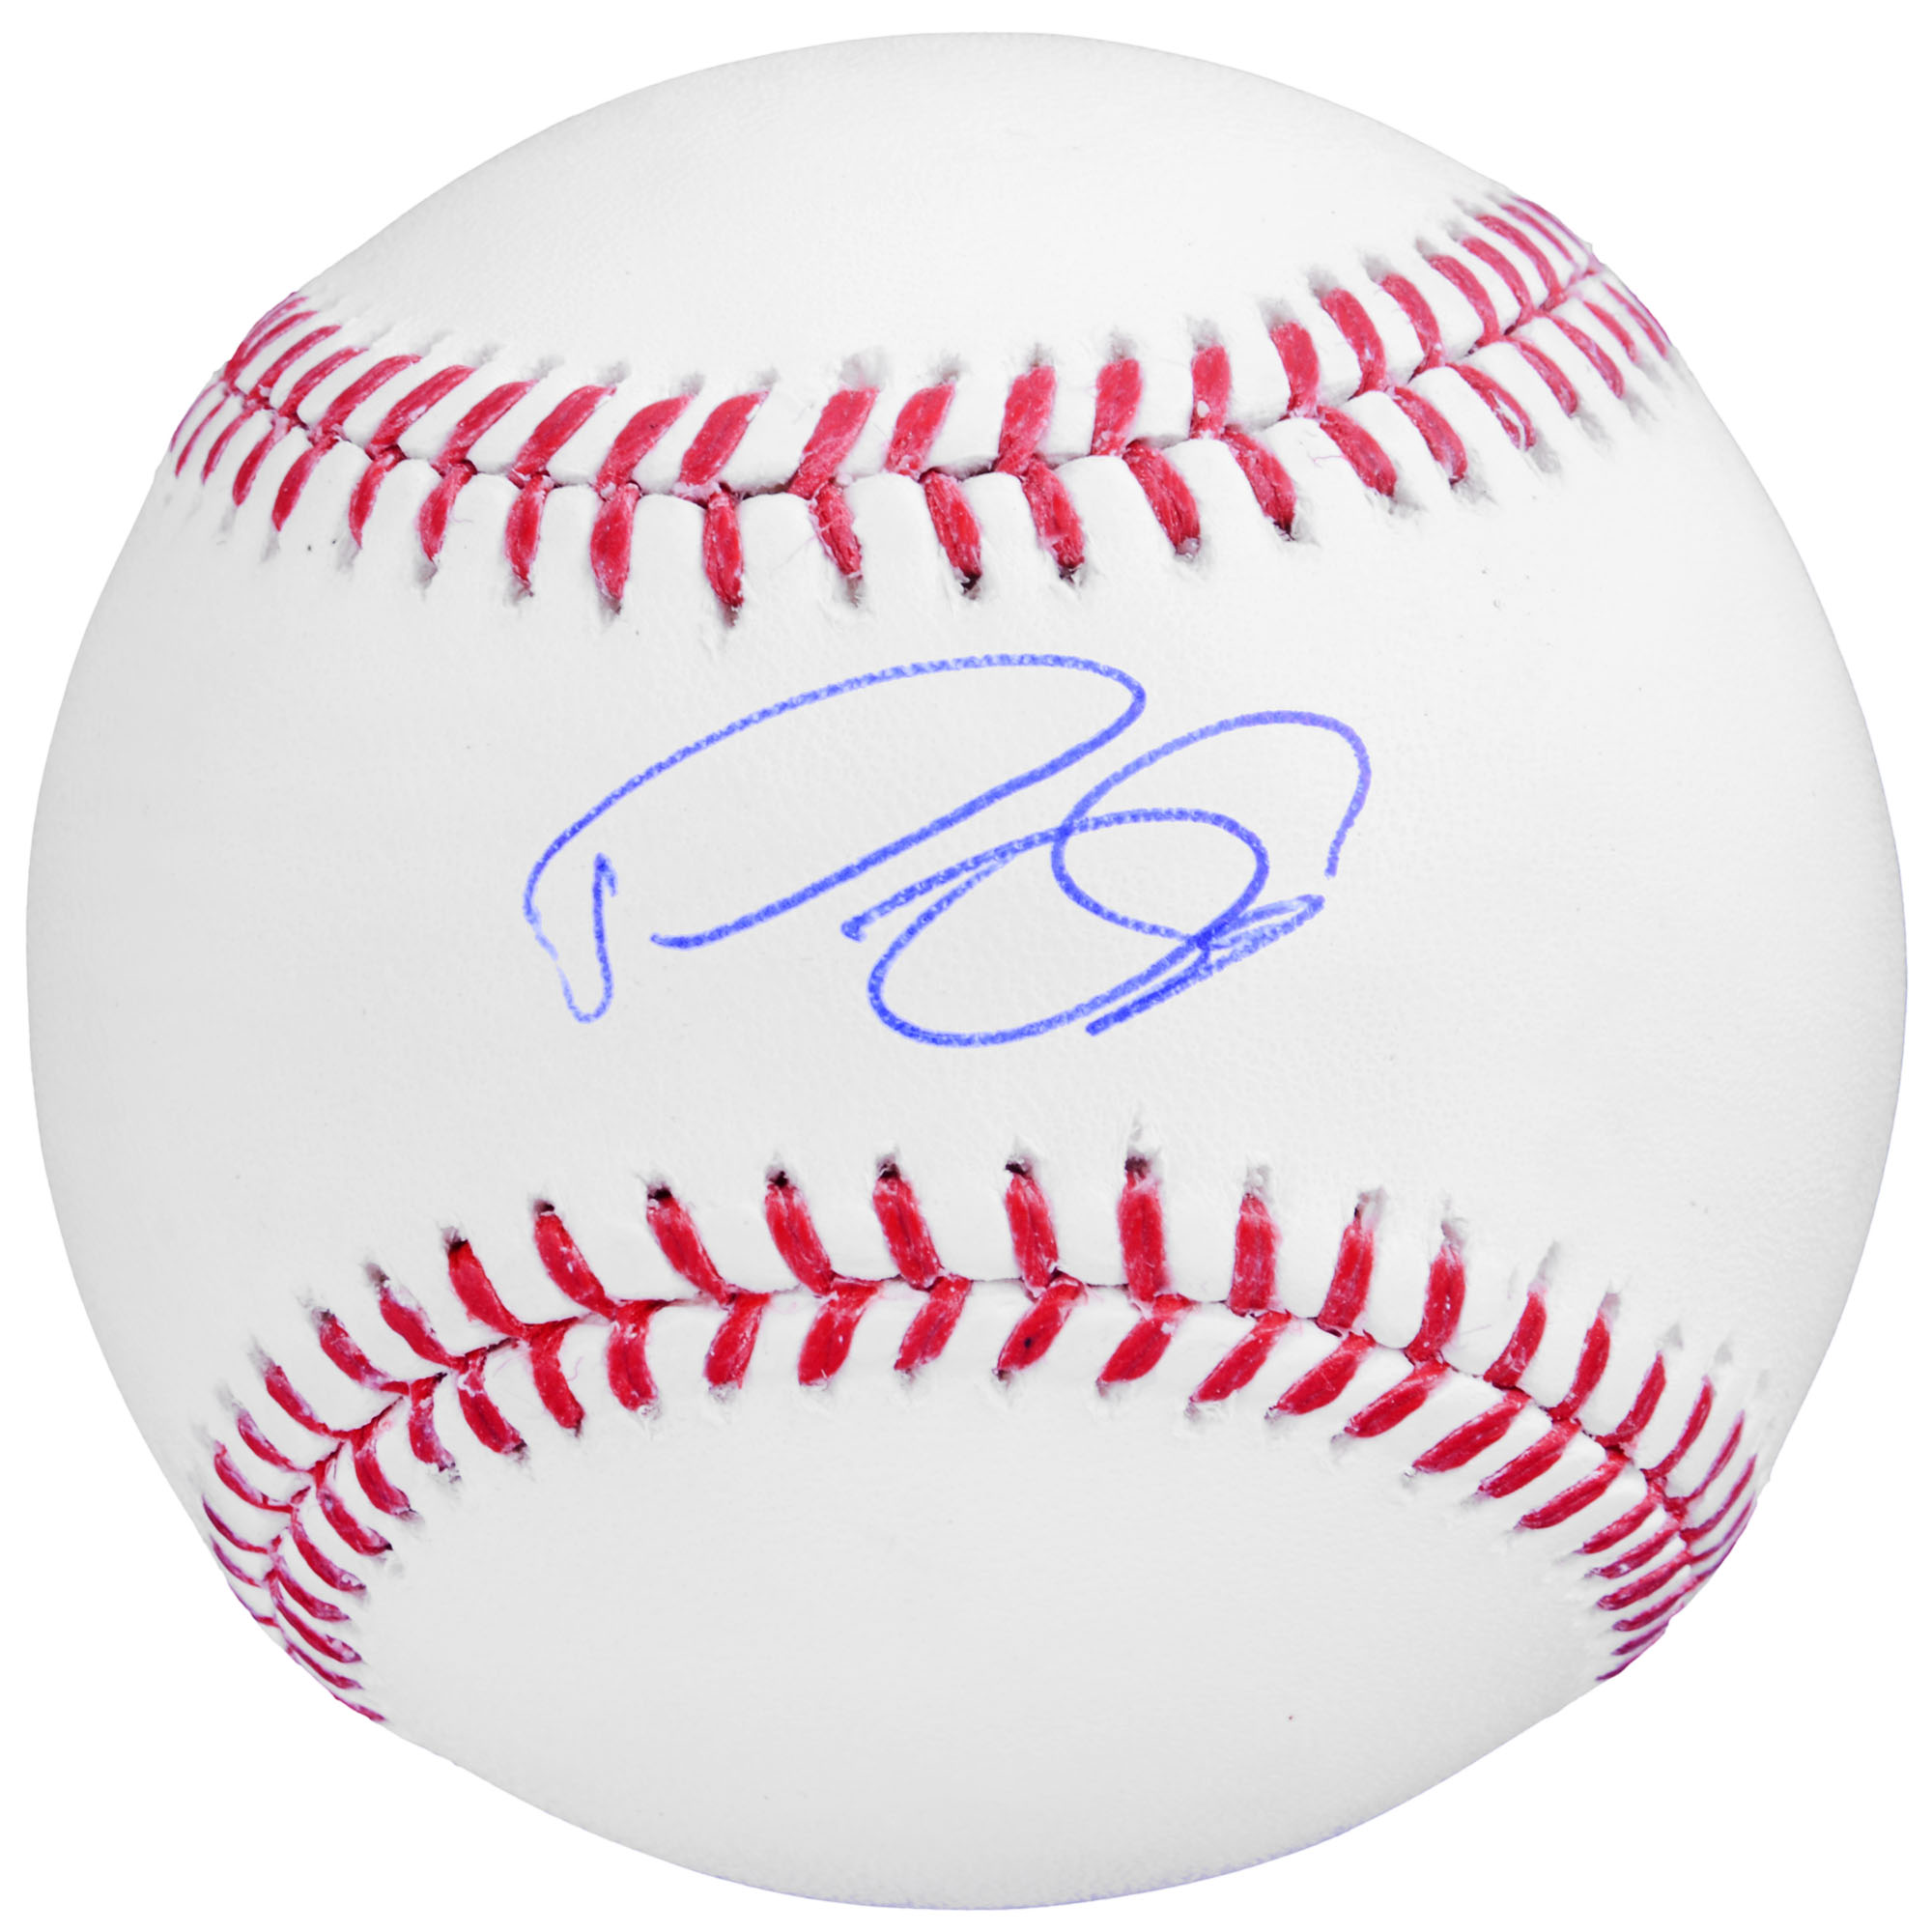 Domingo Santana Houston Astros Fanatics Authentic Autographed Baseball - No Size